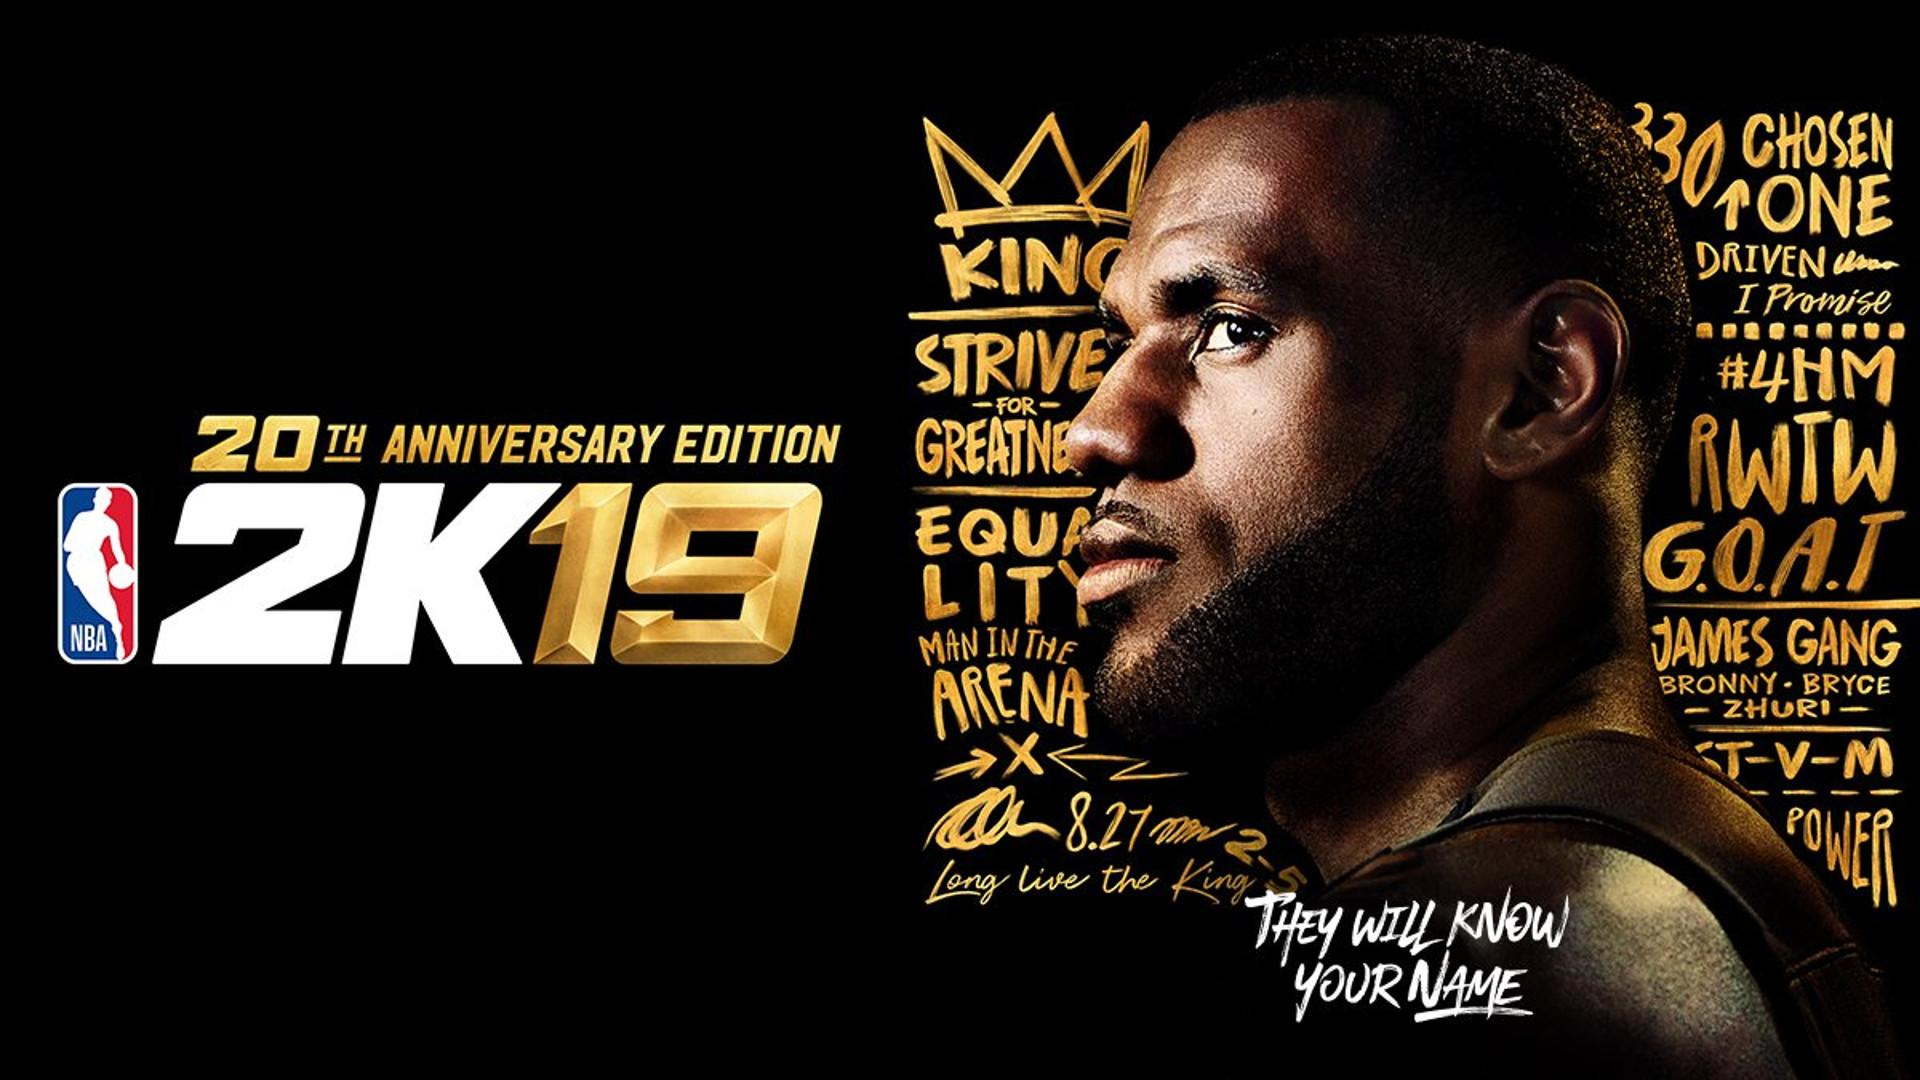 NBA-2K19-LeBron-James-20th-Anniversary-Edition-FTR-060518.jpg